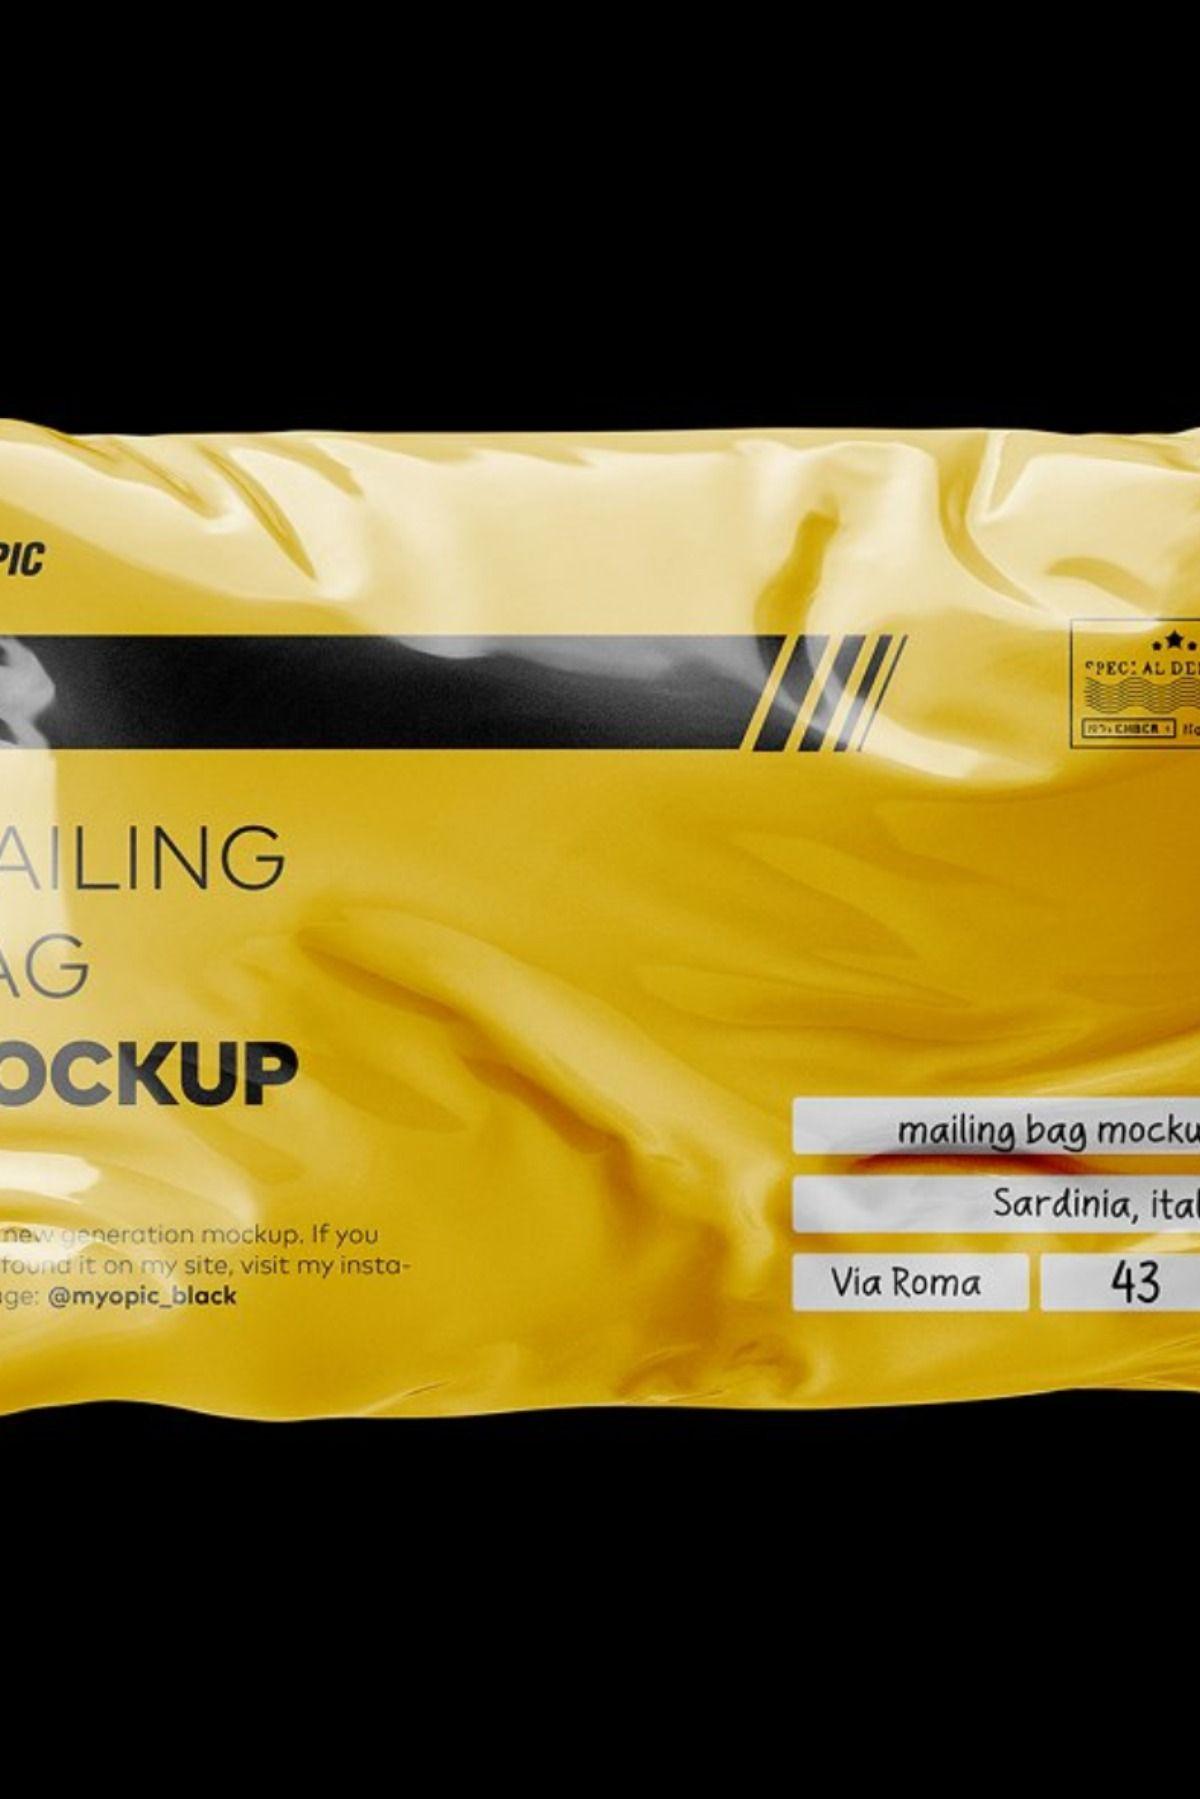 Download Mailing Box Mockup Photoshop In 2020 Mockup Photoshop Bag Mockup Change Background